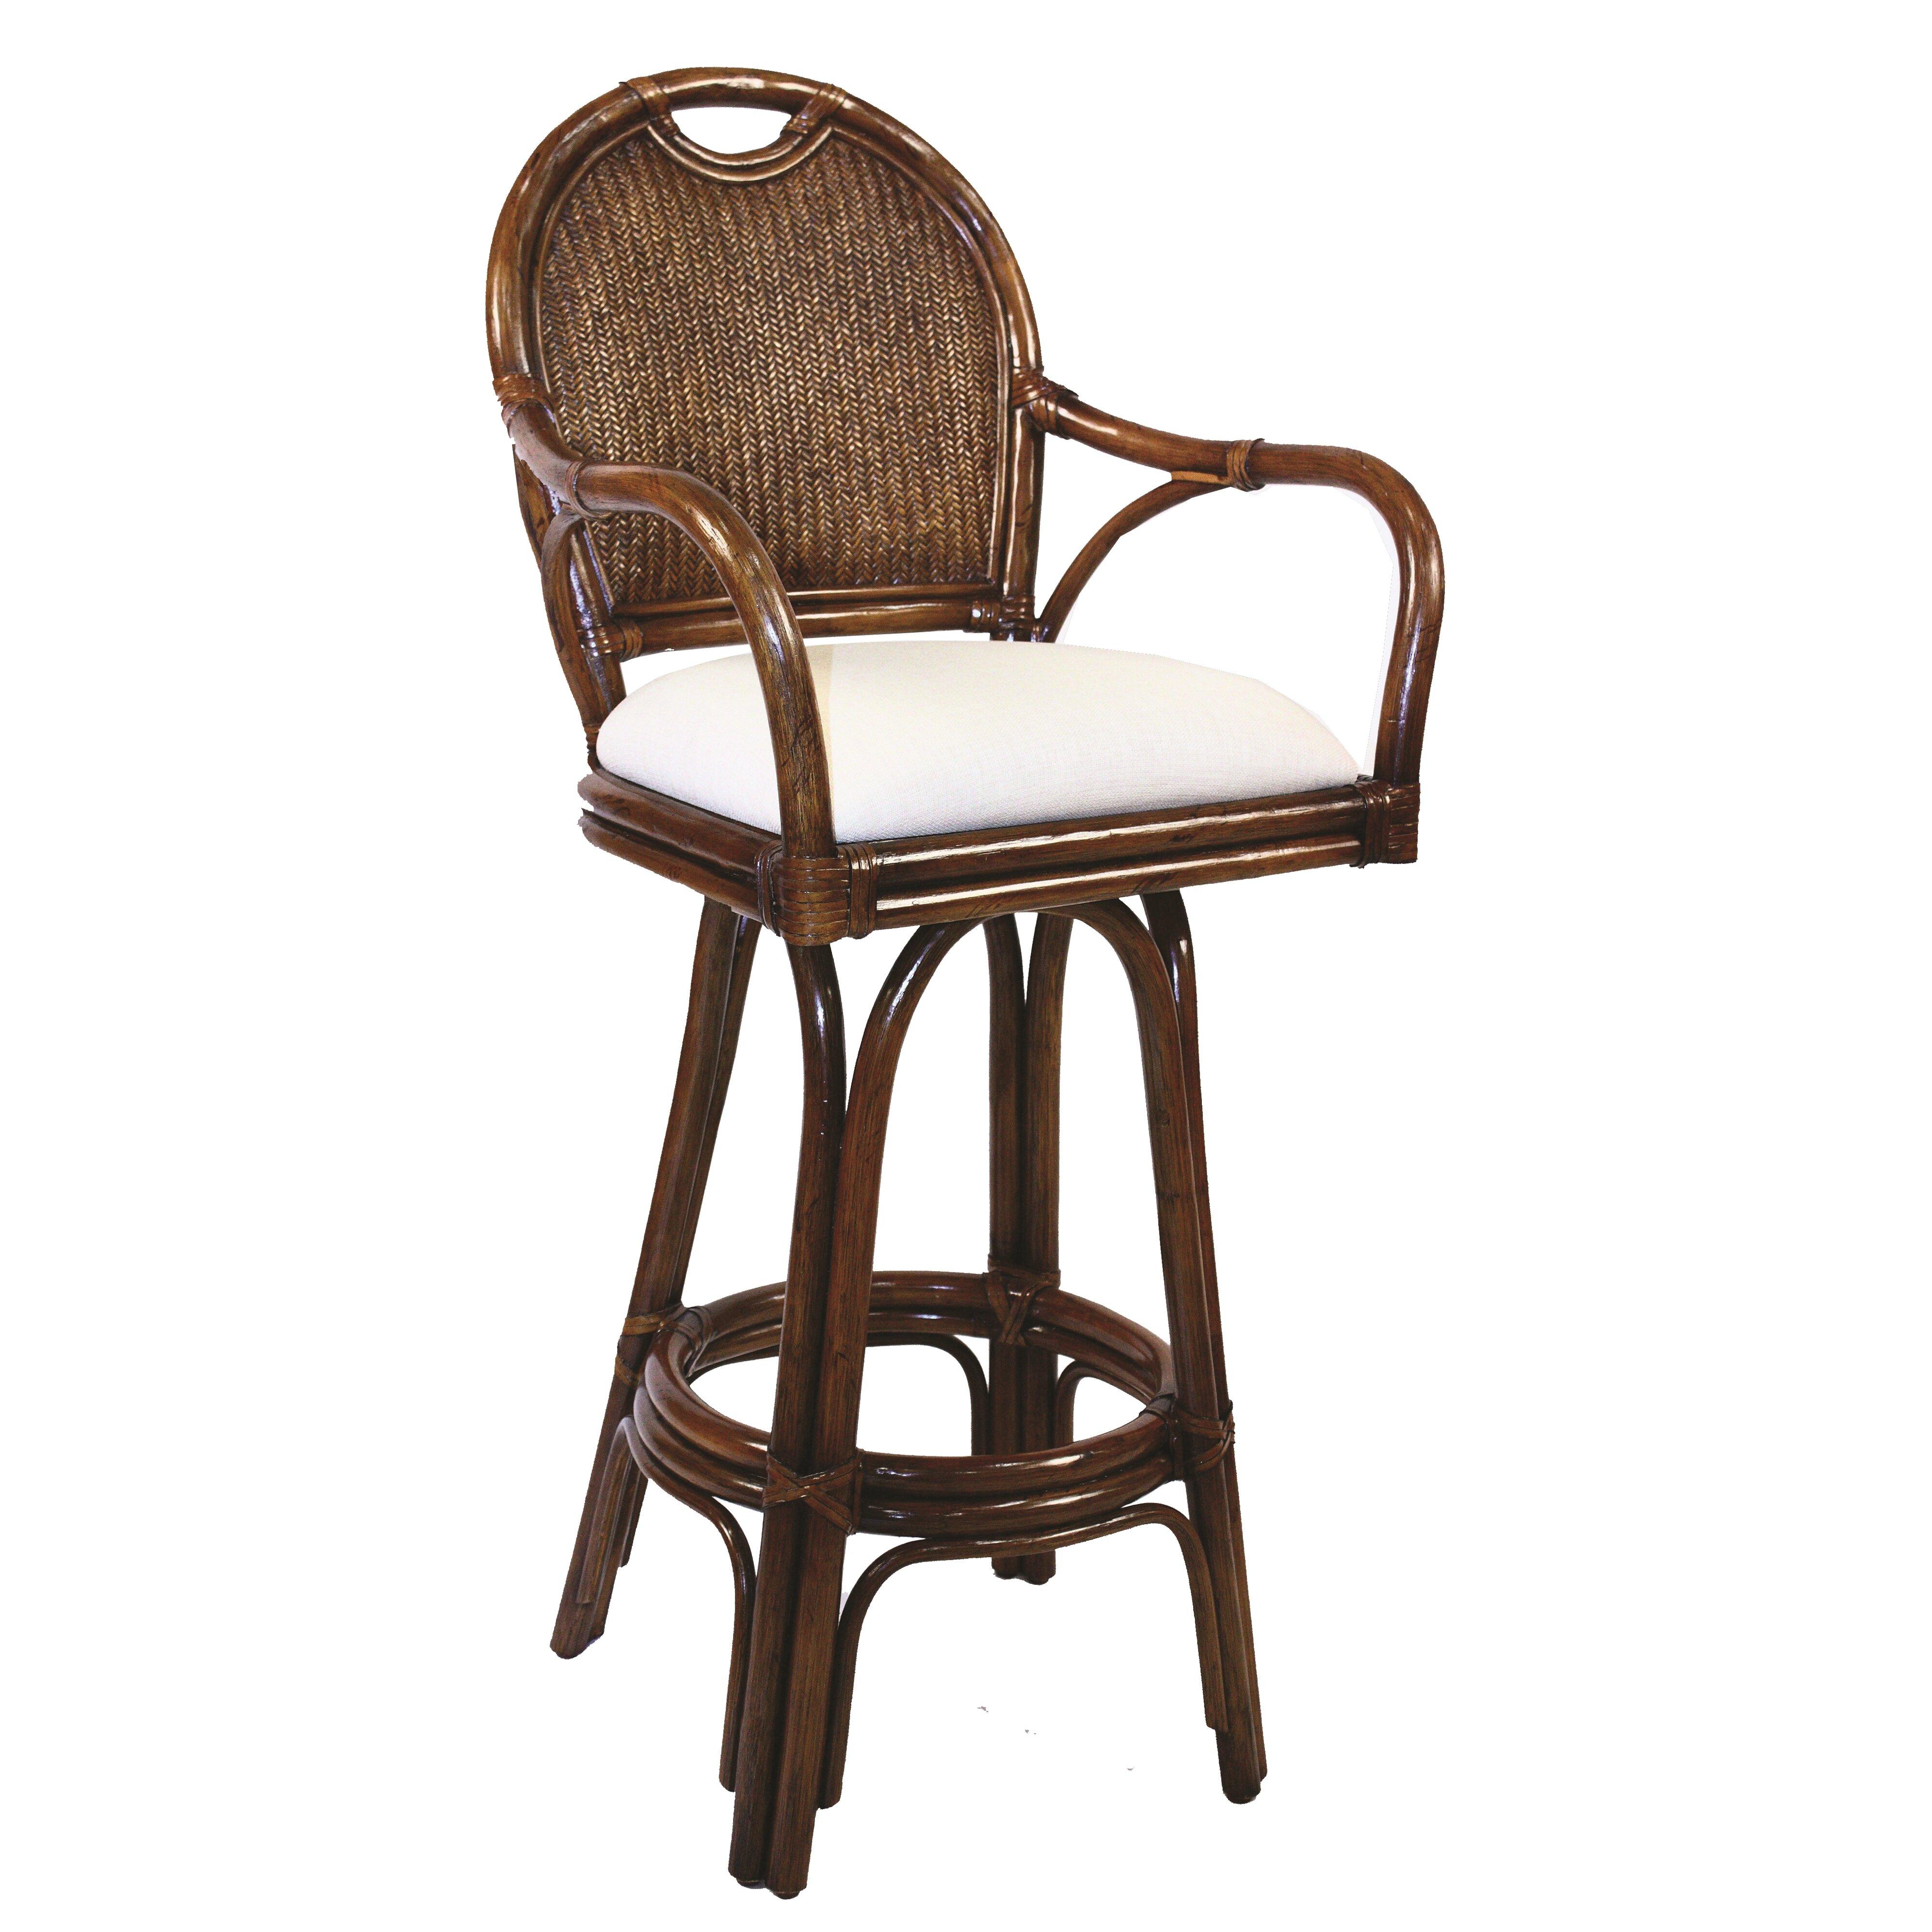 Beachcrest Home Coleridge 24quot Swivel Bar Stool amp Reviews  : Bolinas 24 Swivel Bar Stool with Cushion SEHO1656 from www.wayfair.com size 3985 x 3985 jpeg 1515kB